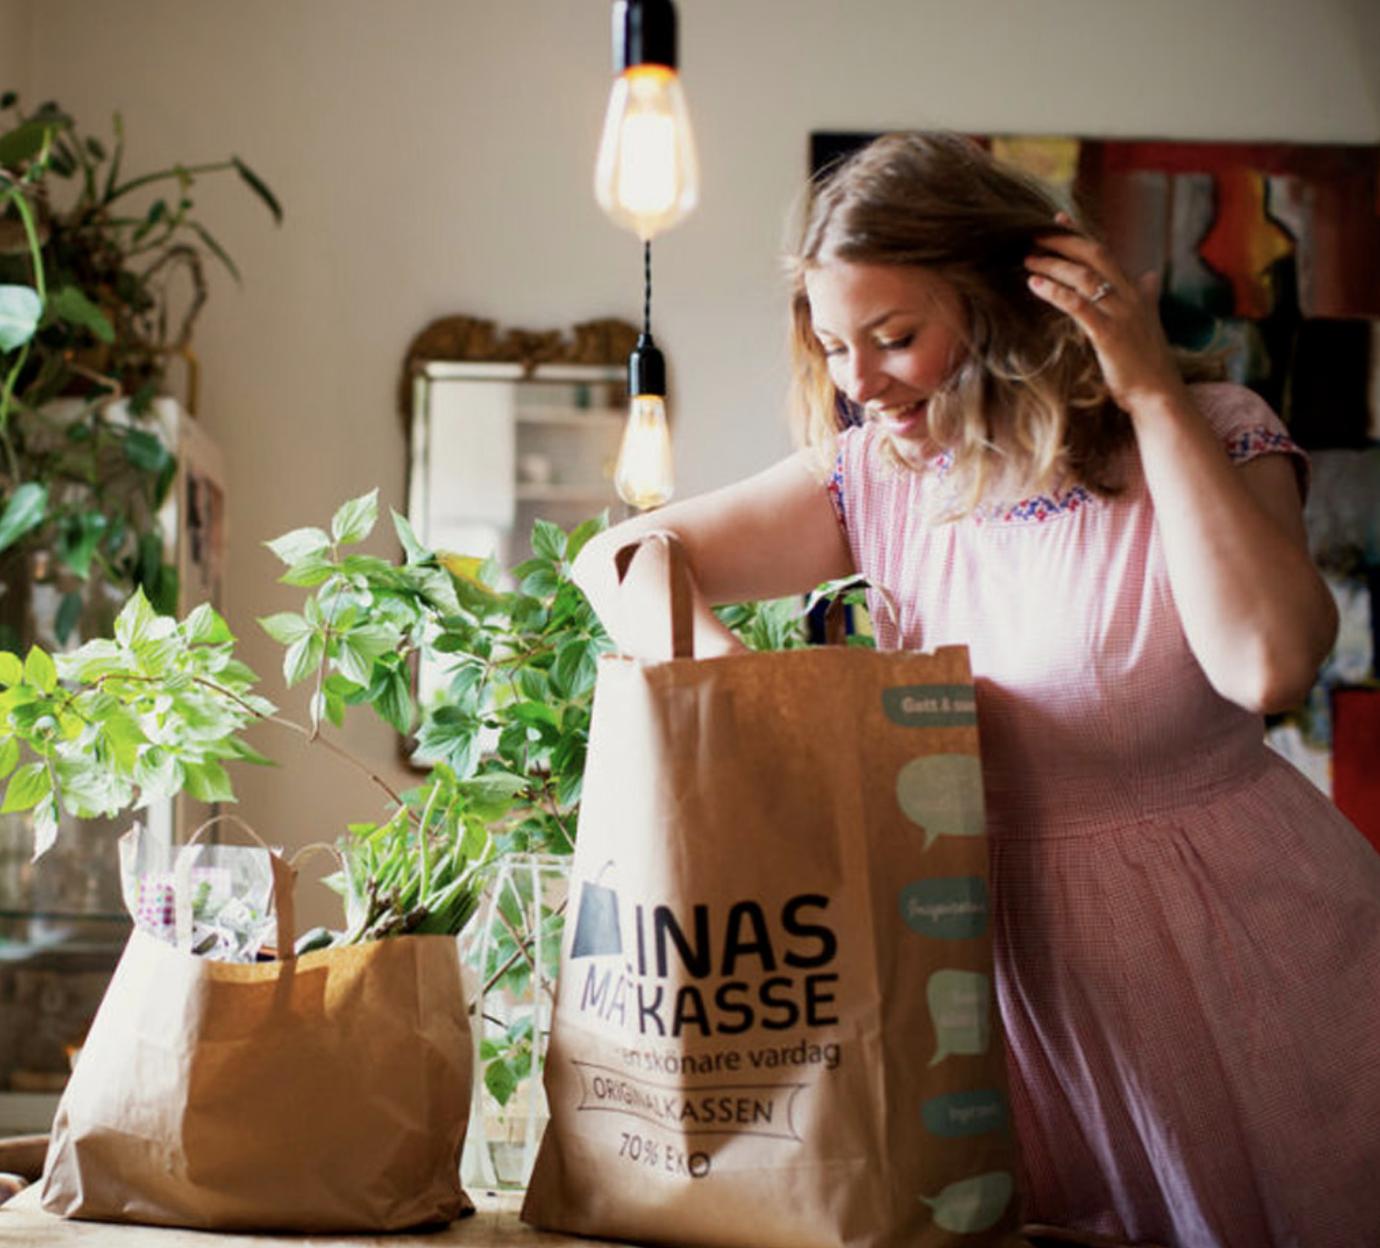 Linas Matkasse - Influencer Marketing